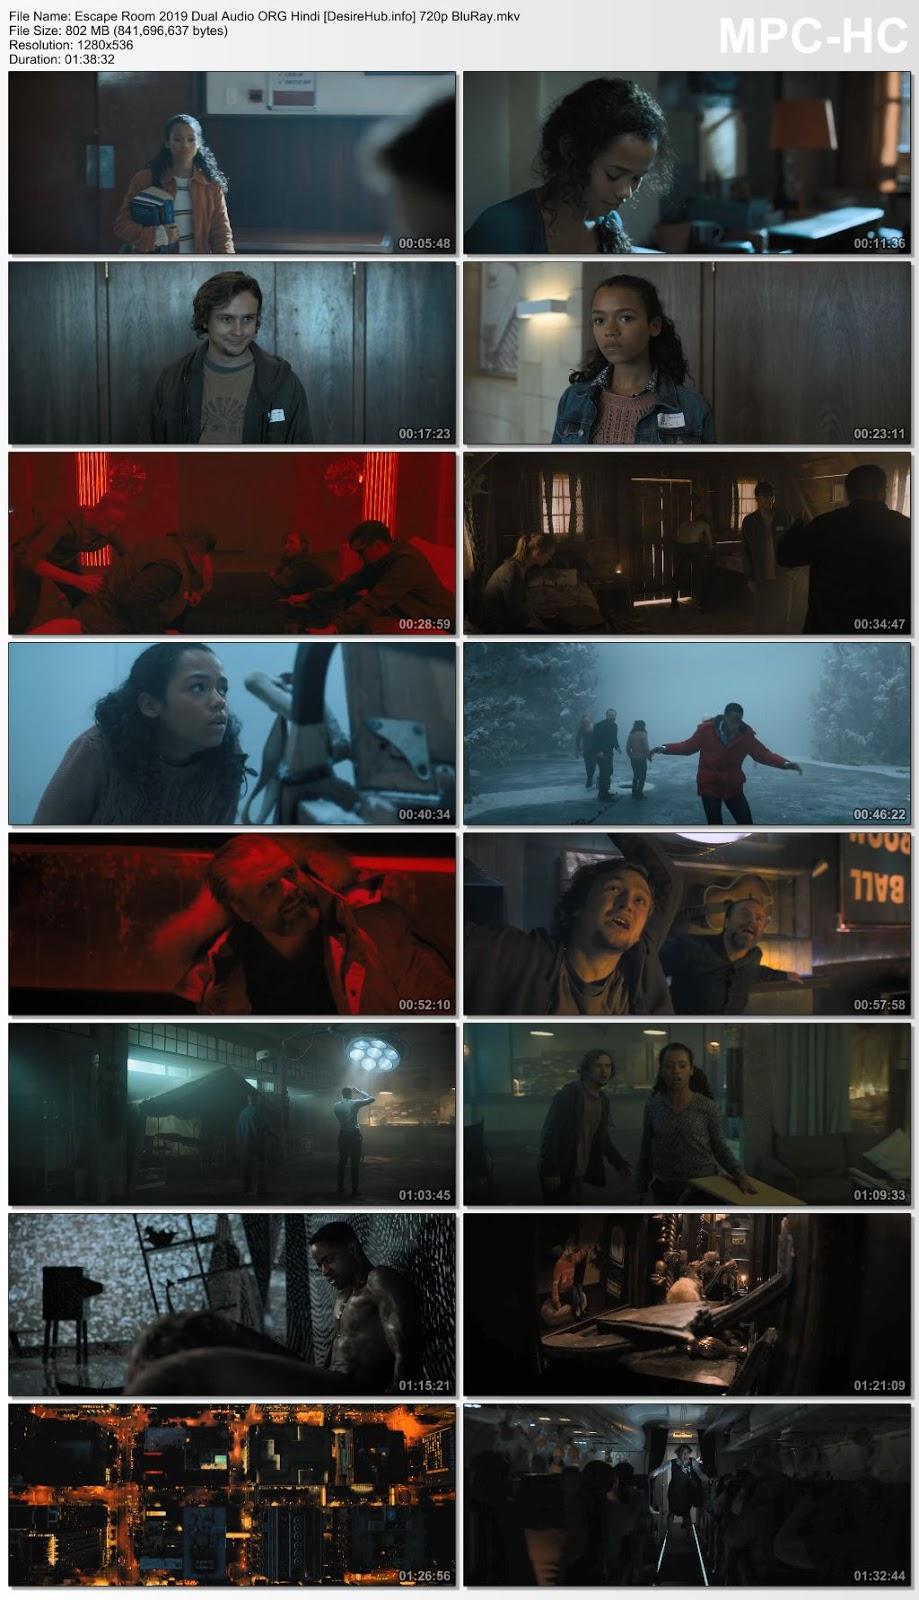 Escape Room 2019 Dual Audio ORG Hindi 480p BluRay 300MB Desirehub